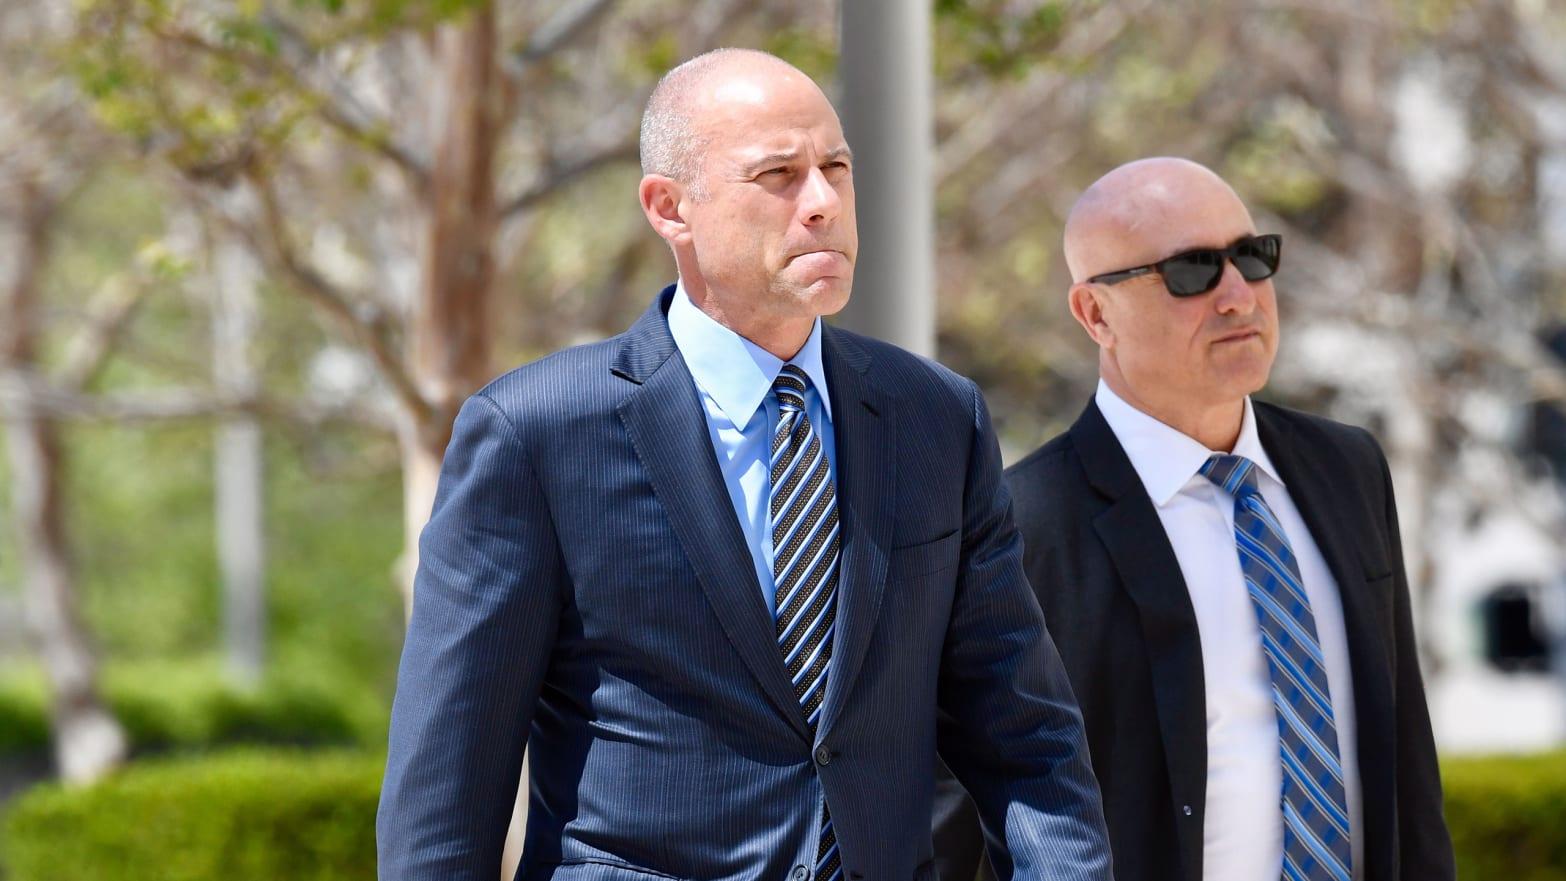 Michael Avenatti: Heckled at California Federal Court Arraignment as 'Creepy Porn Lawyer'